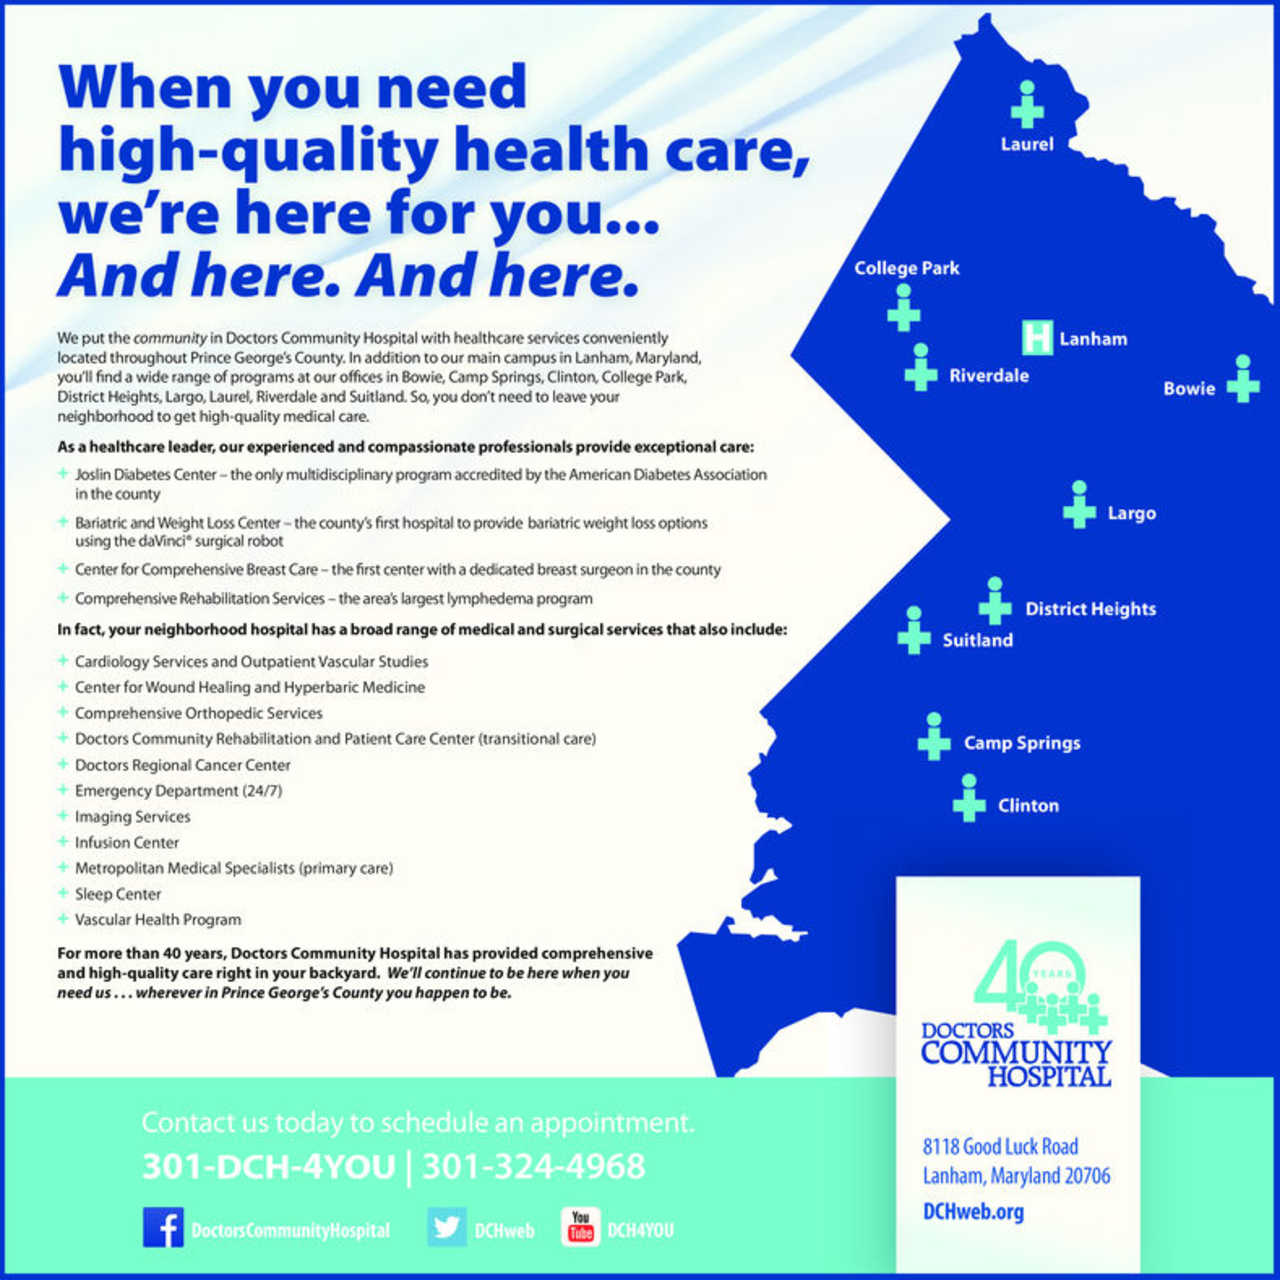 Doctors Community Hospital - Medical - Hospitals in Lanham MD